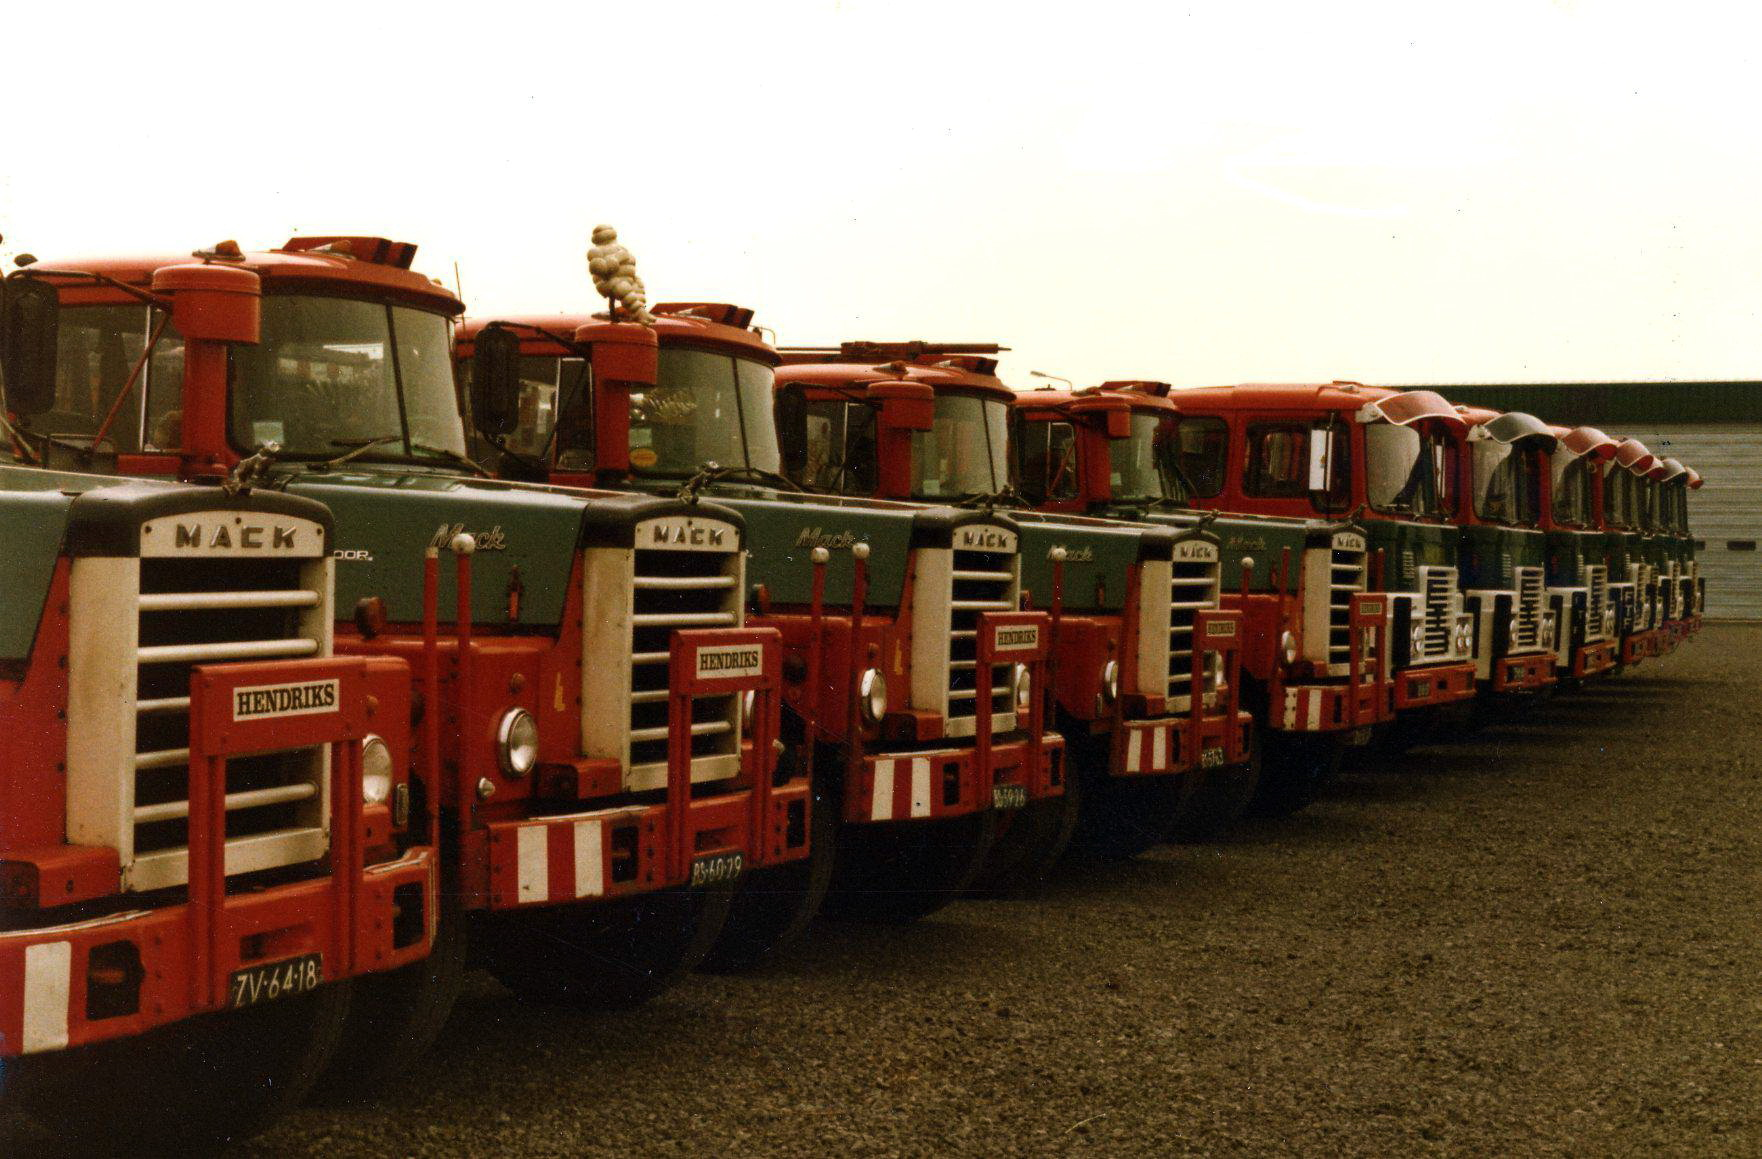 Hendriks-Lobith-5x-Mack-Dm609-S-7x-FTF